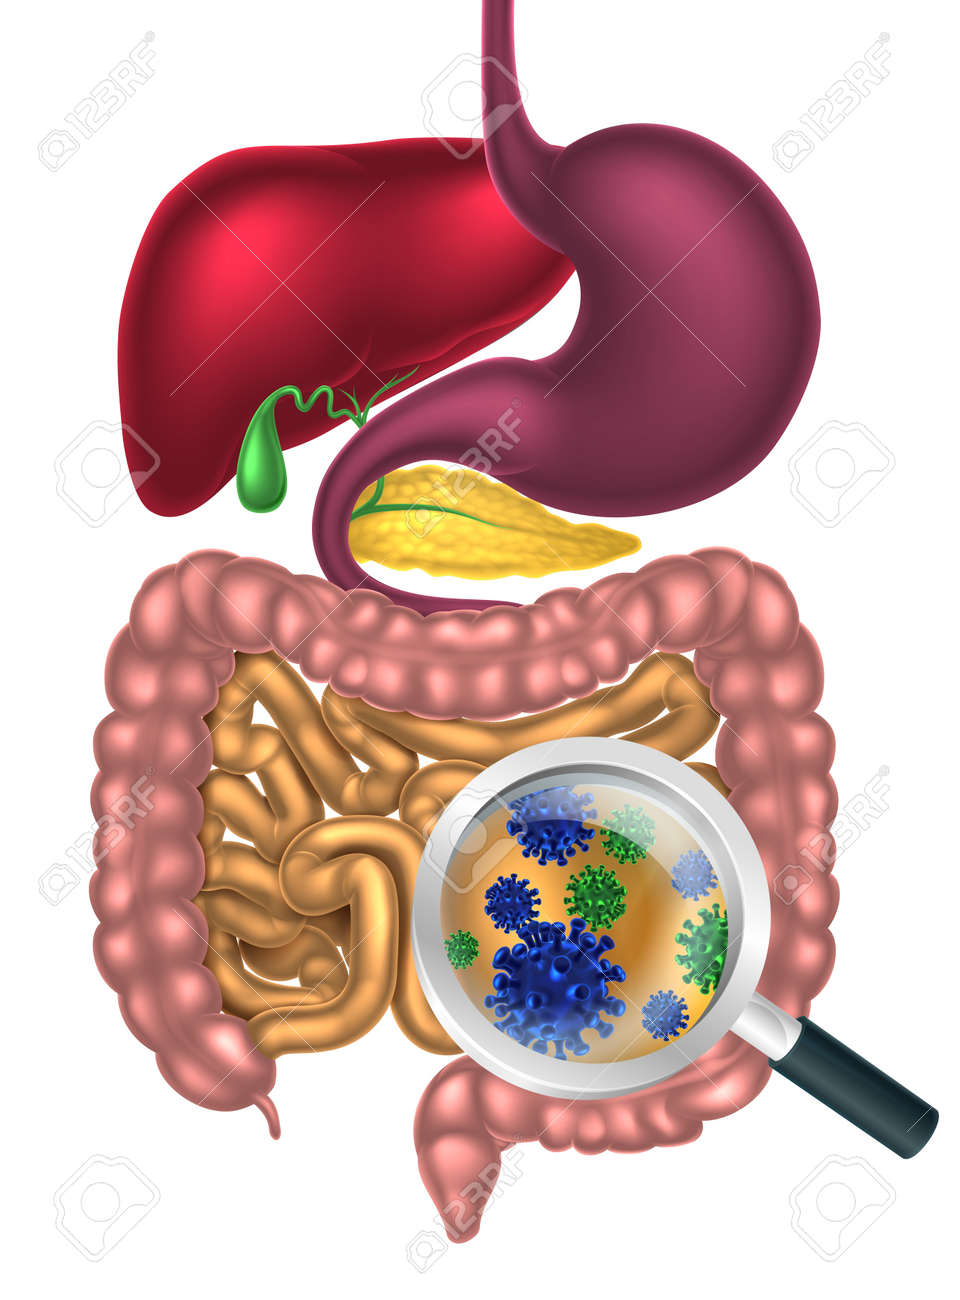 Gripa intestinala – cum o putem combate?